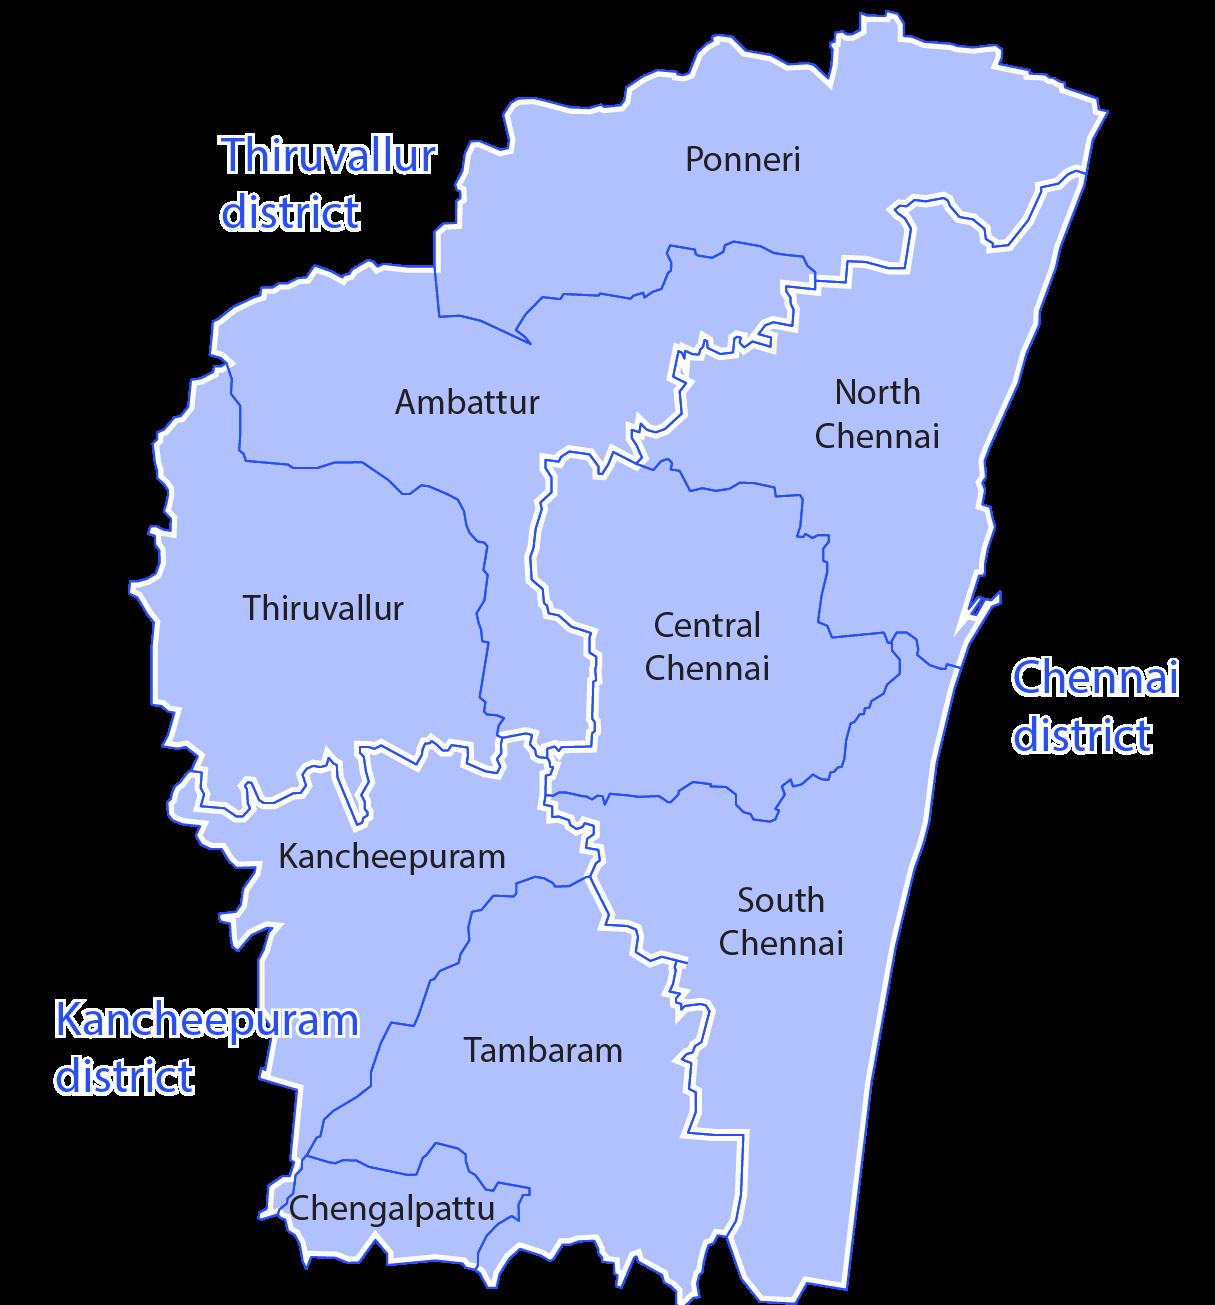 Speculation on Property in Chennai: Location Tambaram